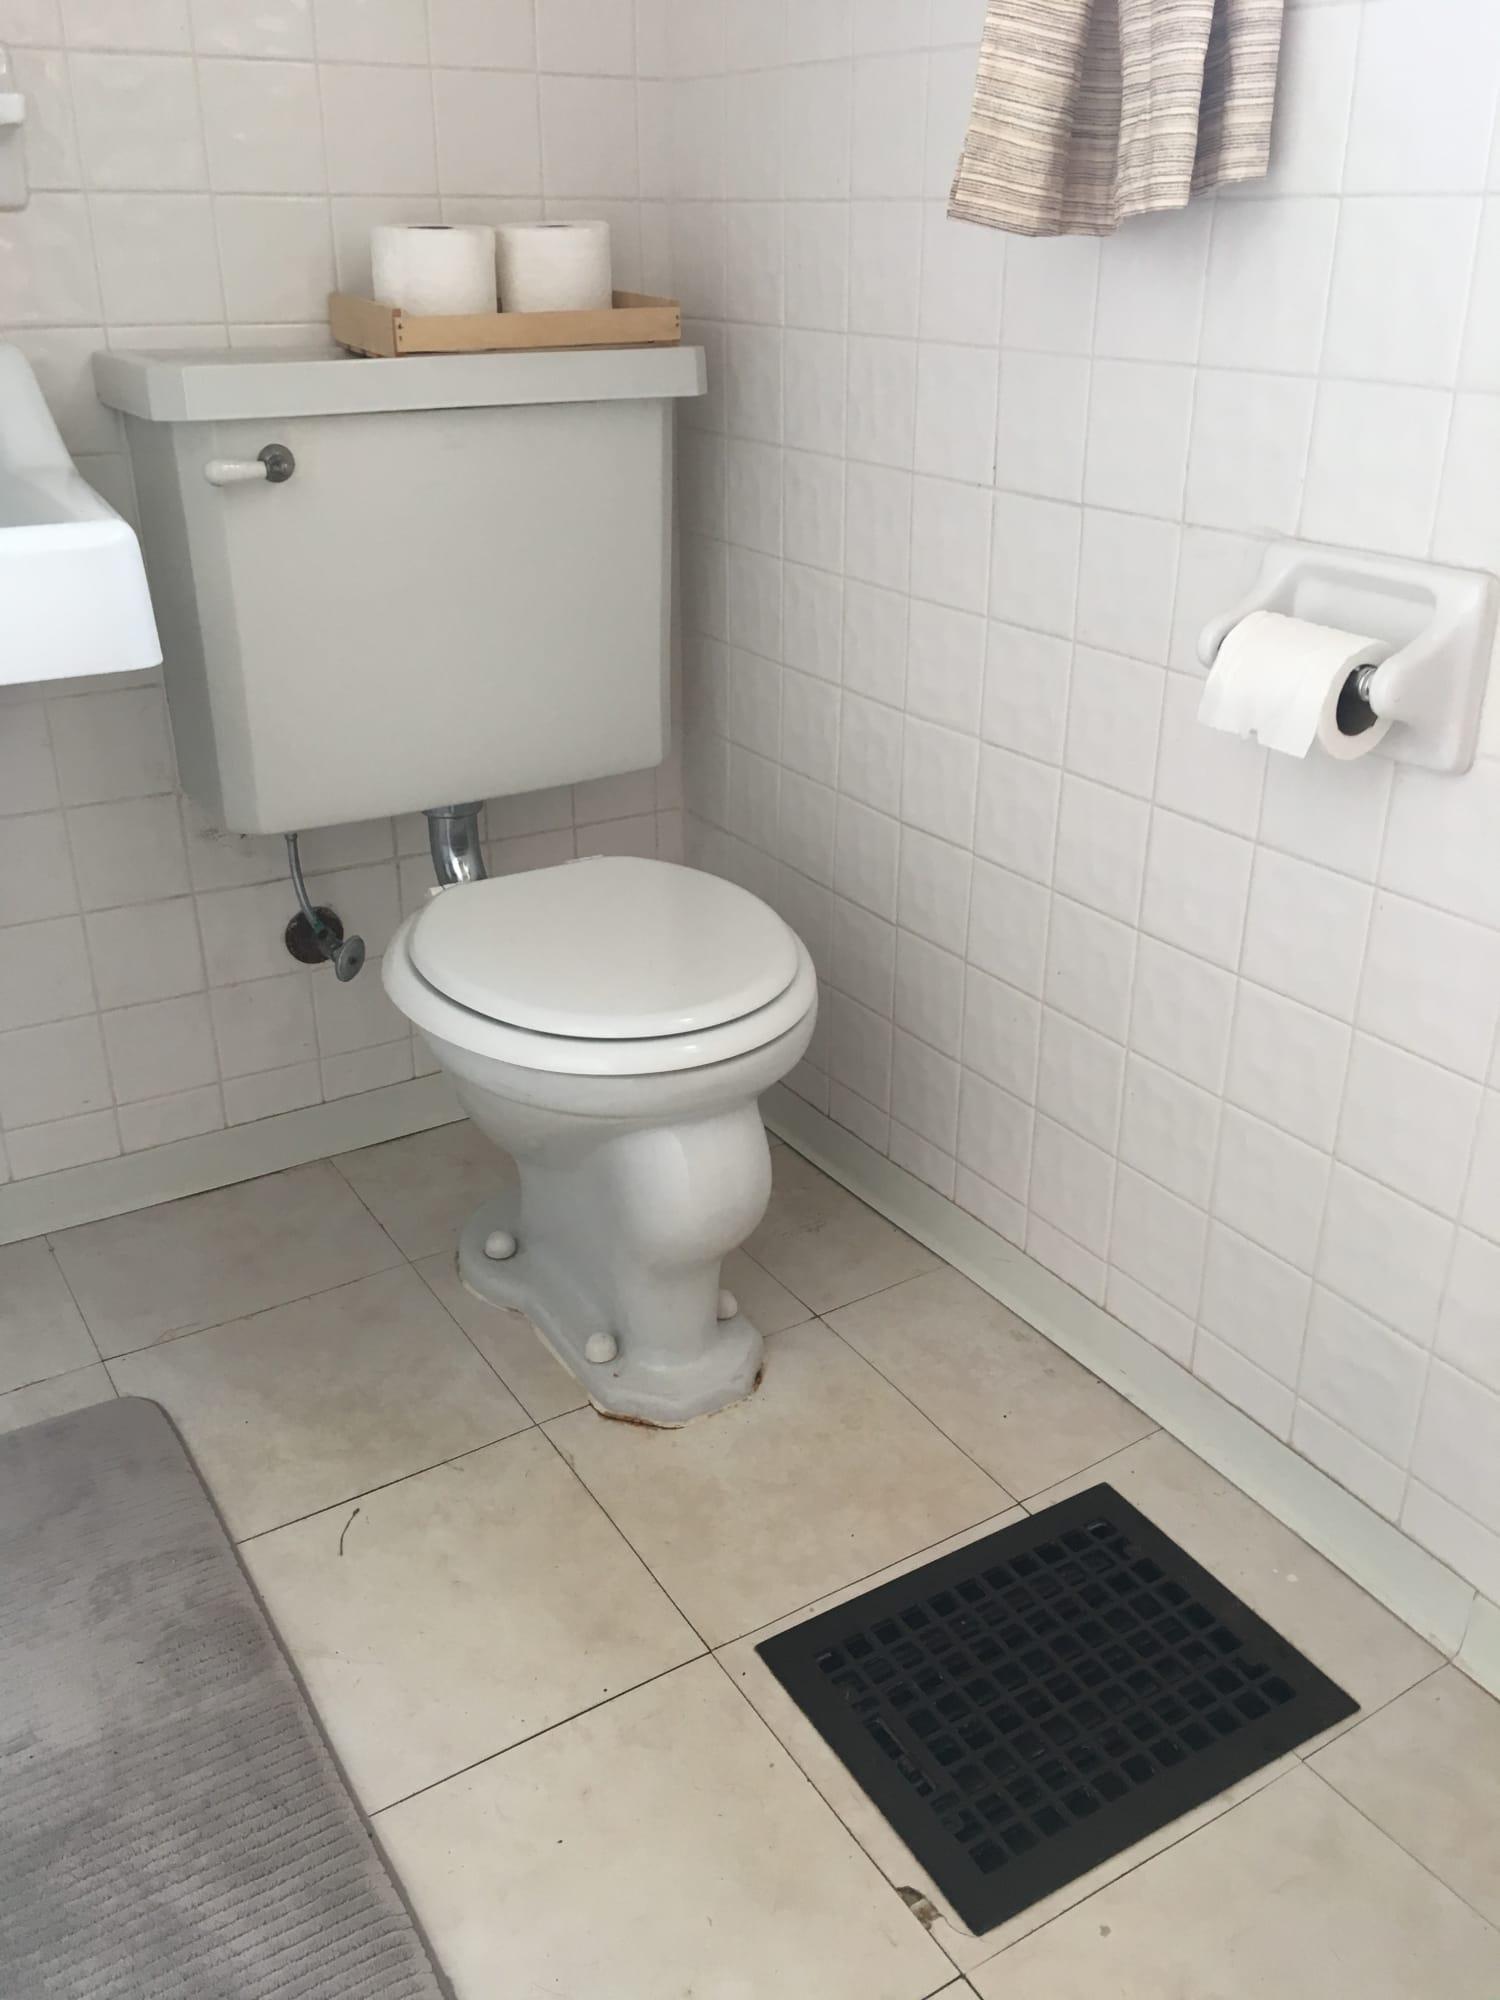 Luxury Vinyl Tile - Plank Flooring For Rental Bathrooms | Apartment